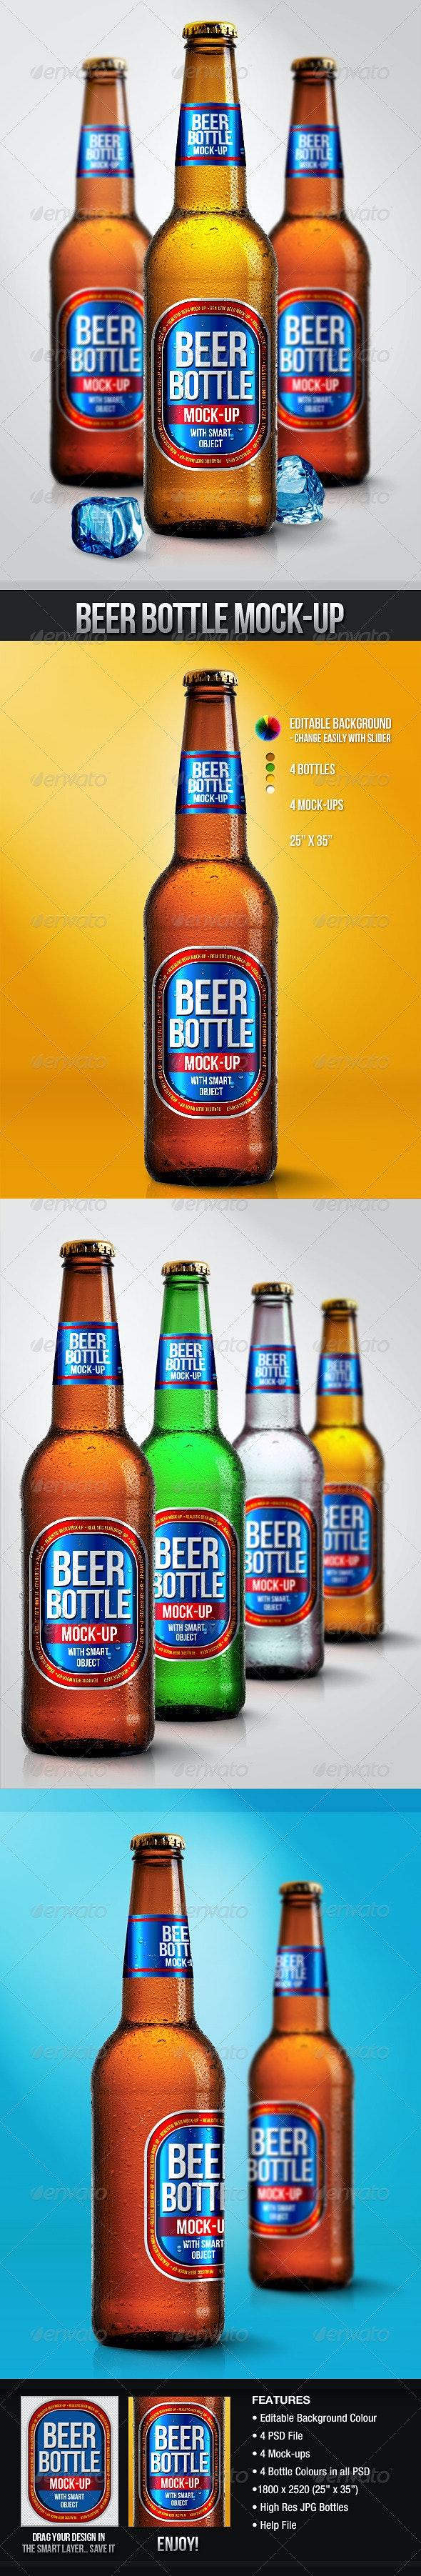 Beer Bottle Mock-Ups - Food and Drink Packaging